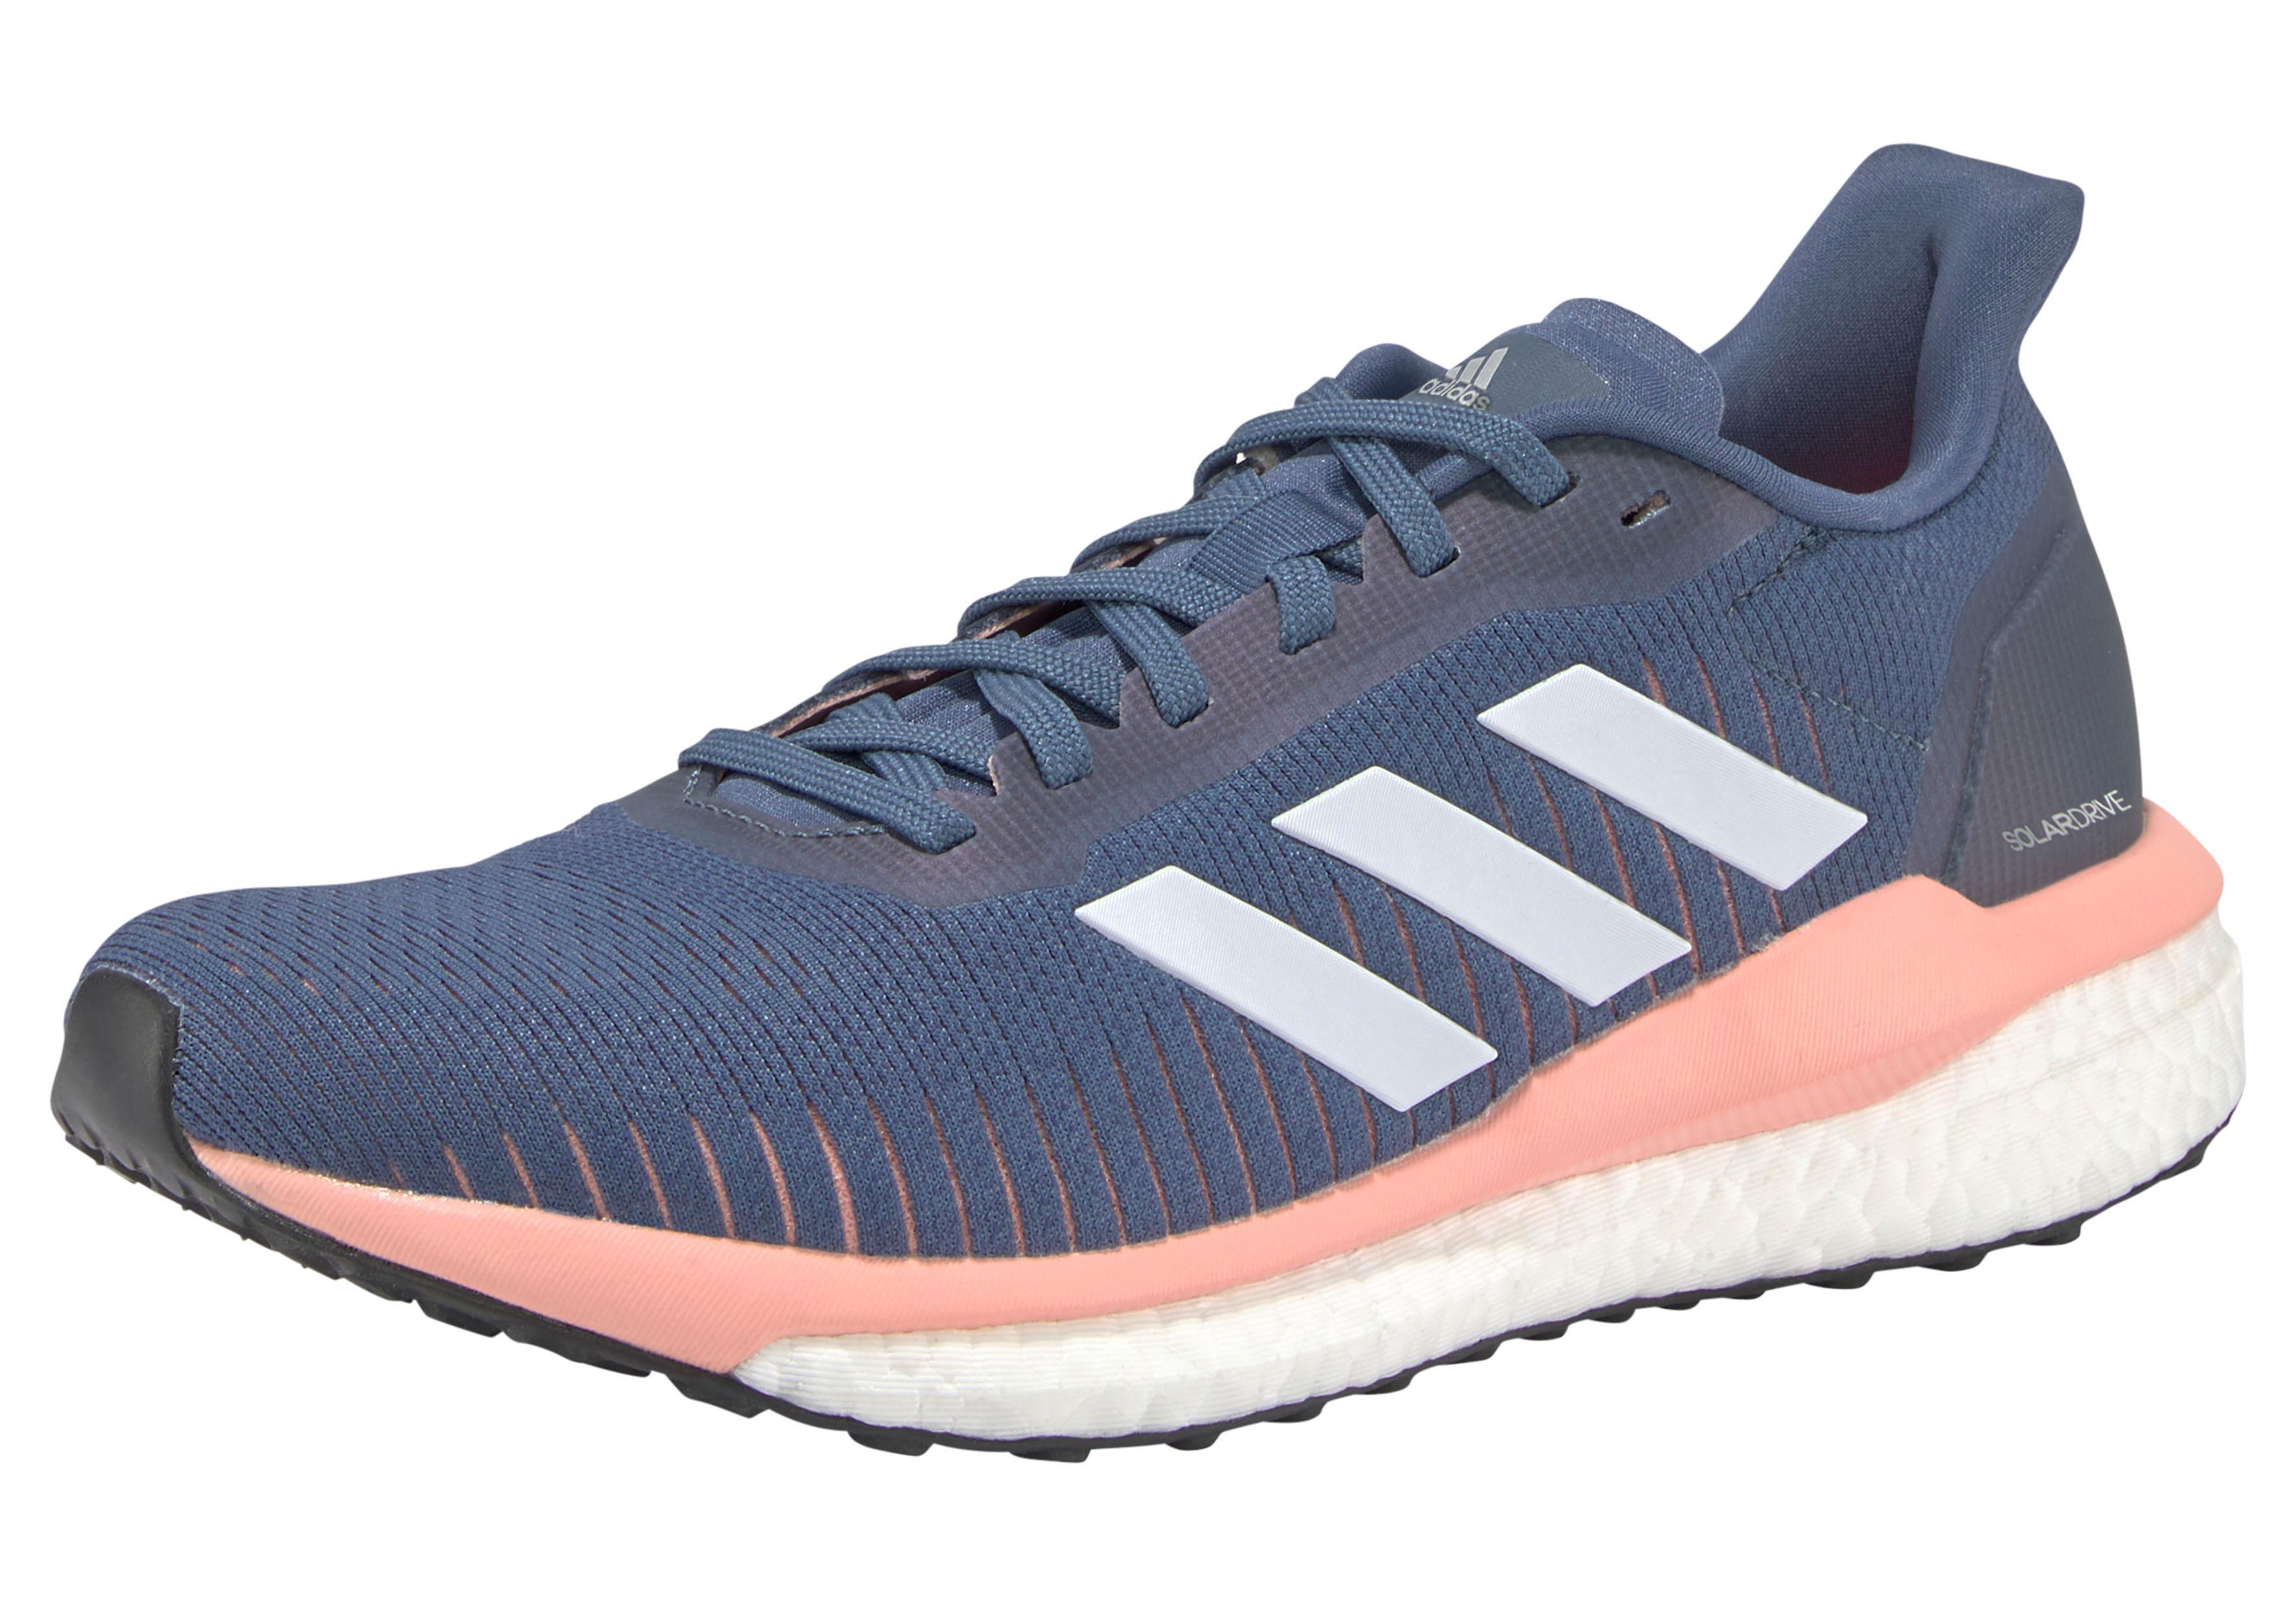 adidas Performance Laufschuh SOLAR DRIVE 19 W | Schuhe > Sportschuhe | adidas performance